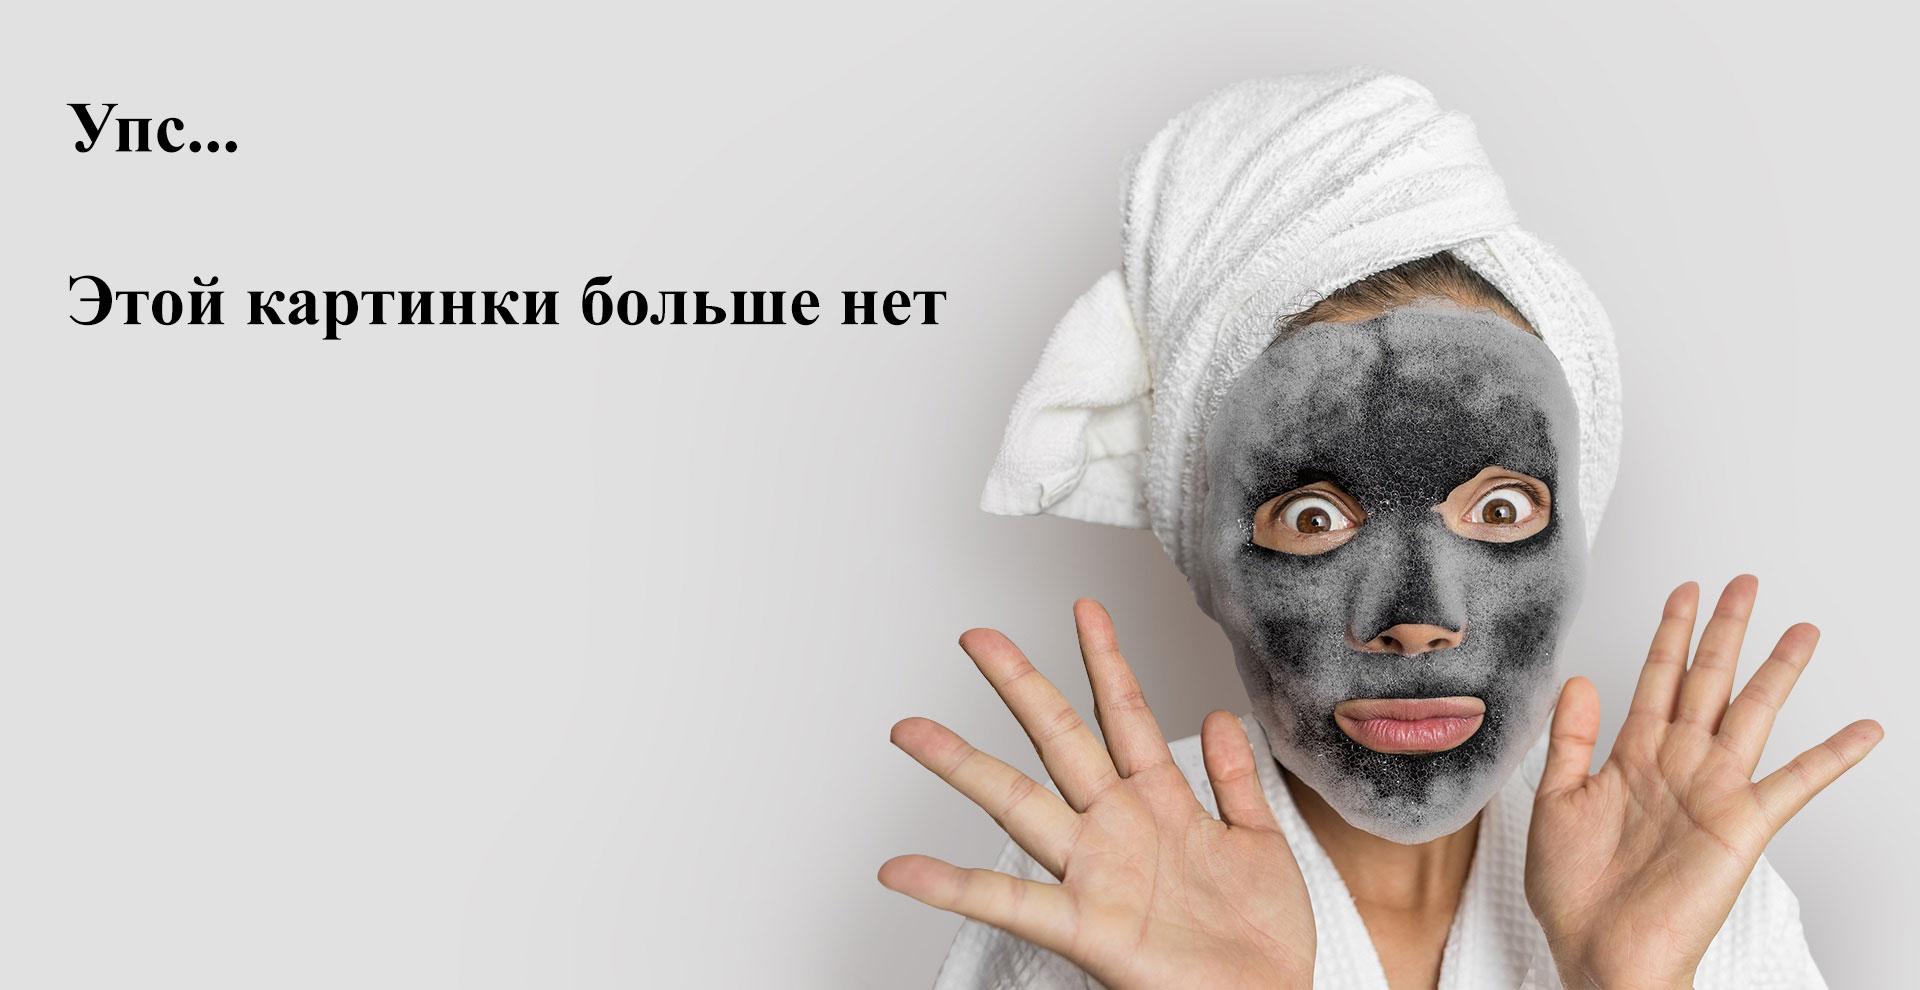 Domix, Nail Prep 2 в 1, Обезжириватель для ногтей, 500 мл